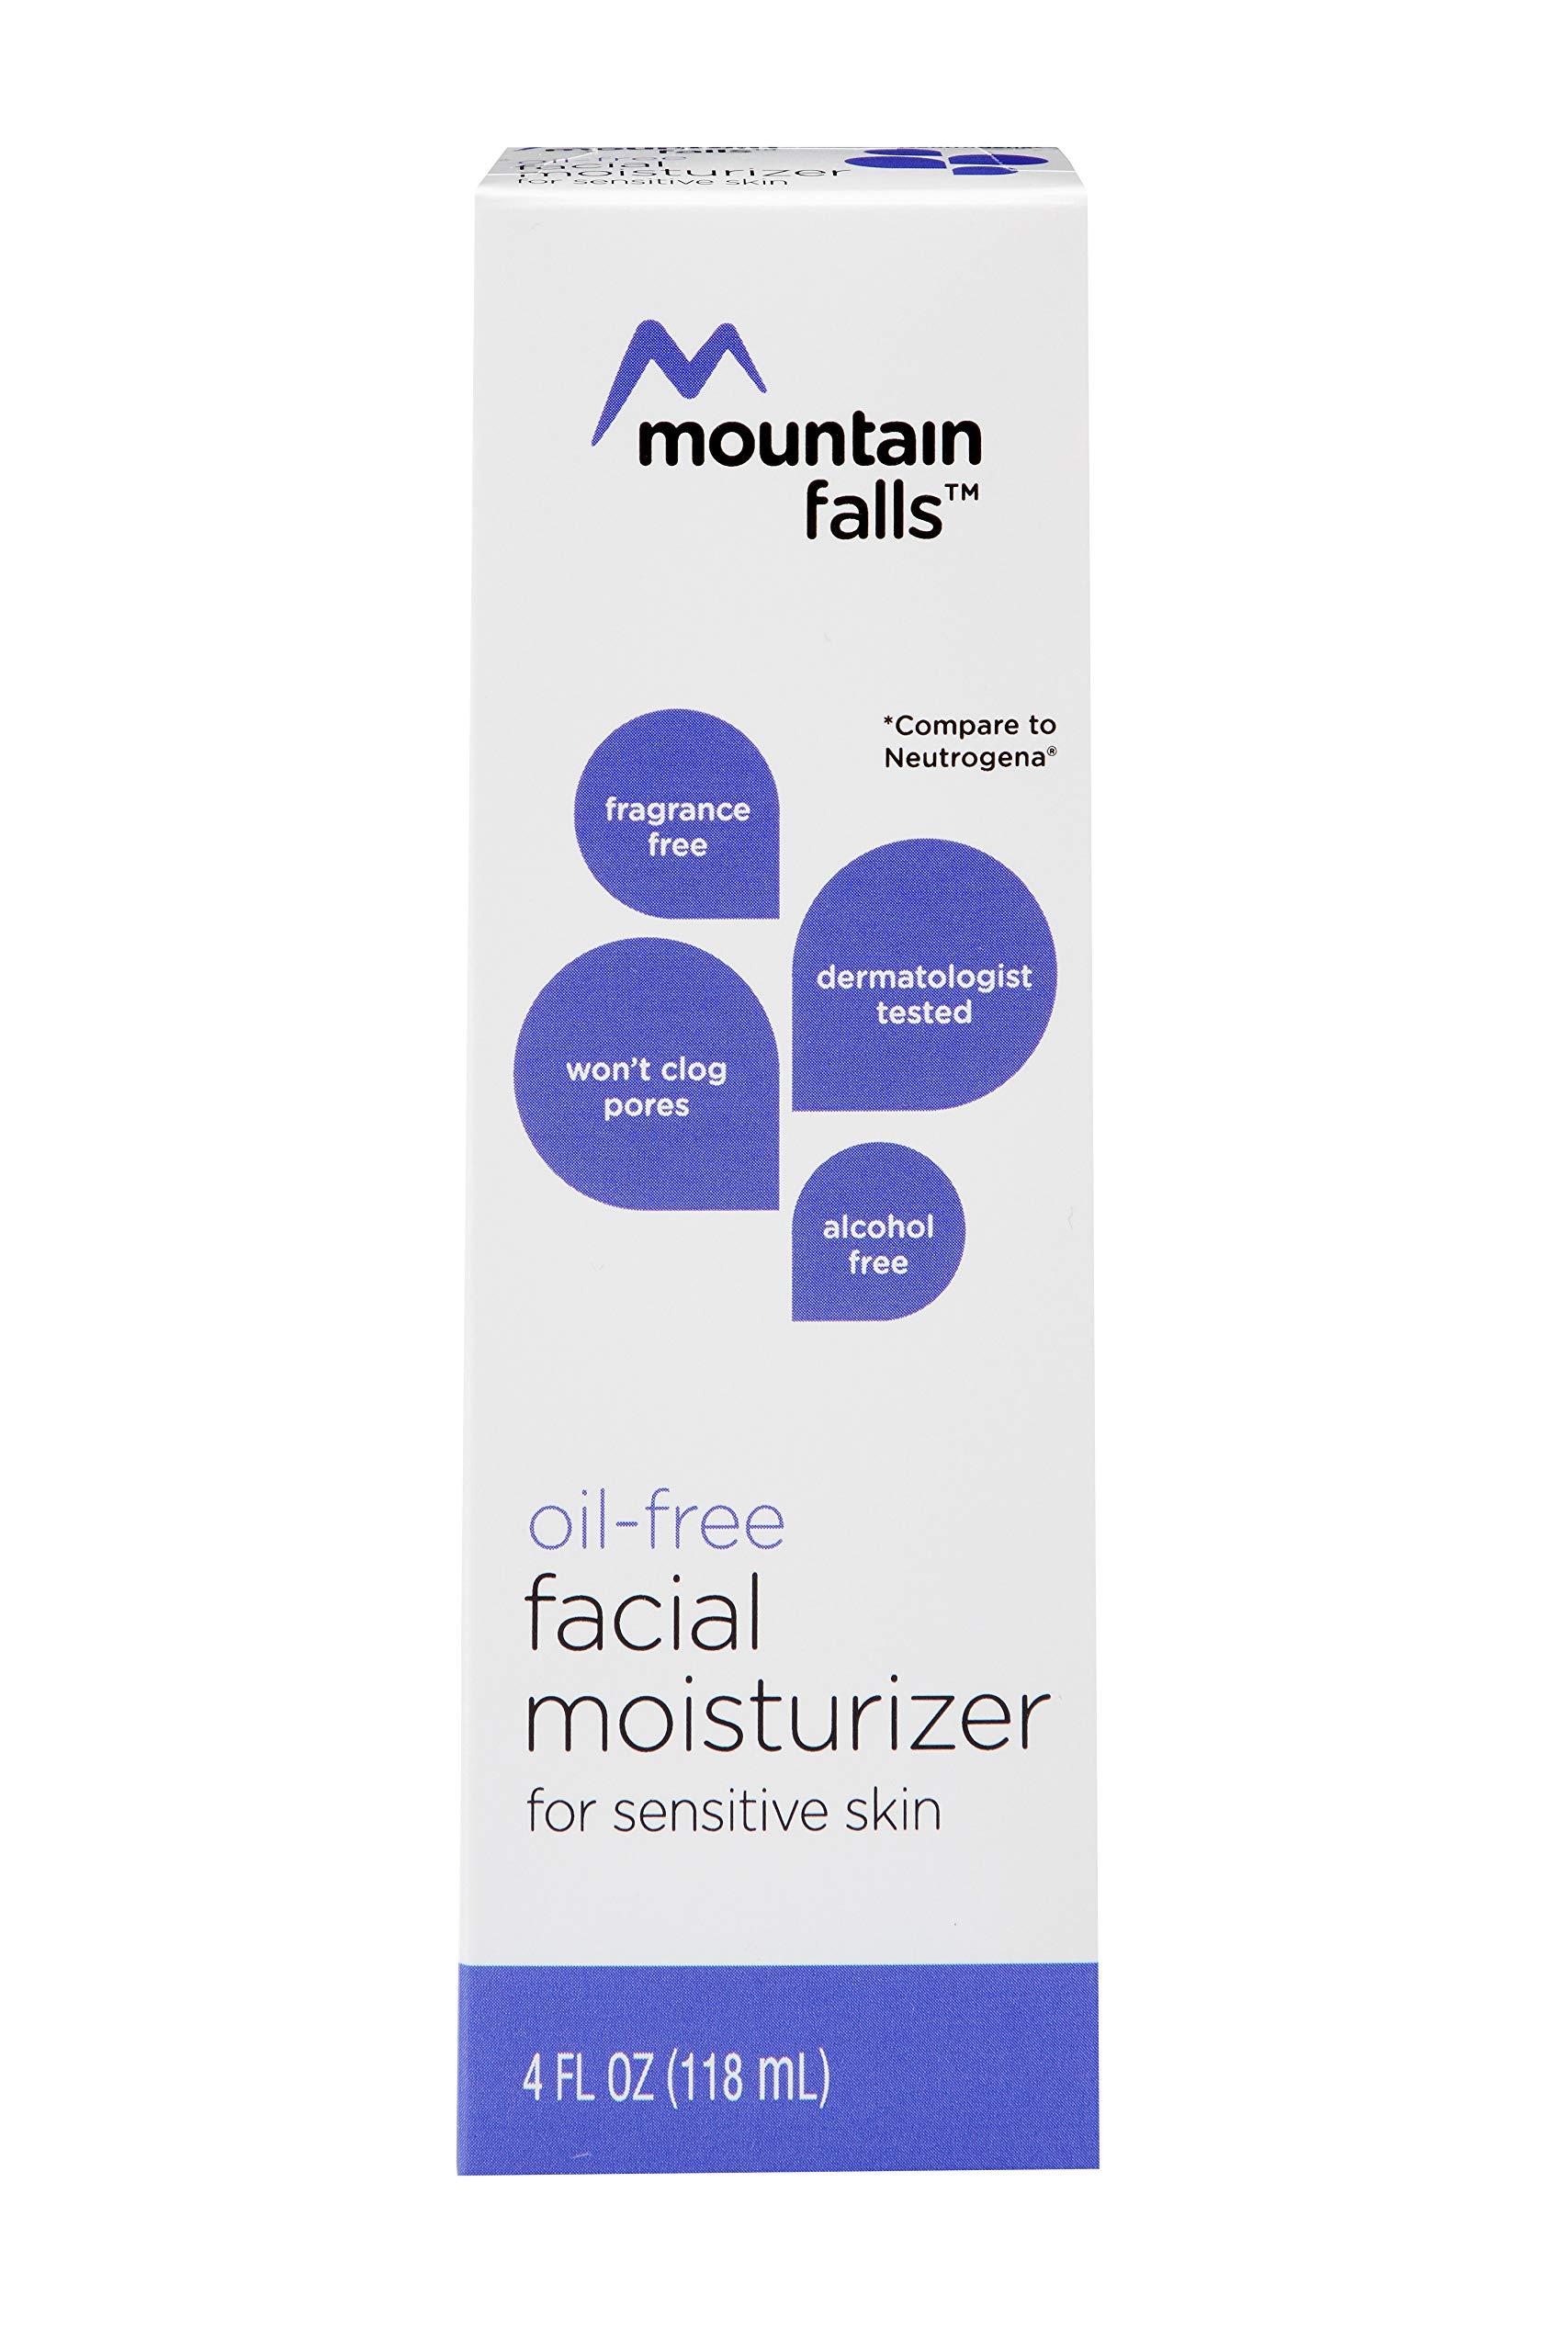 Mountain Falls Oil-Free Facial Moisturizer for Sensitive Skin, Sensitive Skin, Hypoallergenic, Compare to Neutrogena, 4 Fluid Ounce